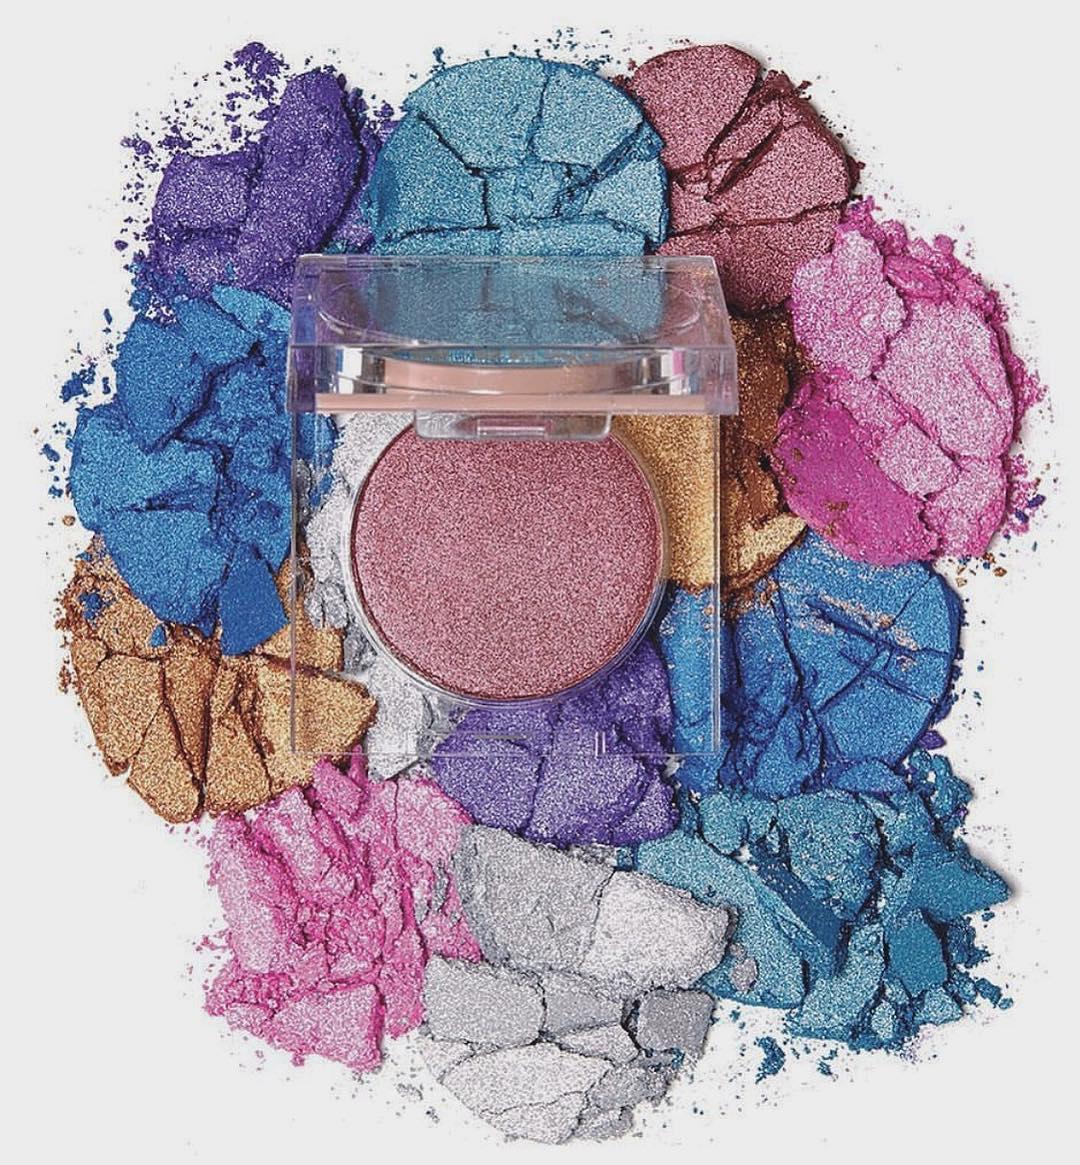 Makeup - KKW Beauty's 'Flashing Lights' Makeup Collection